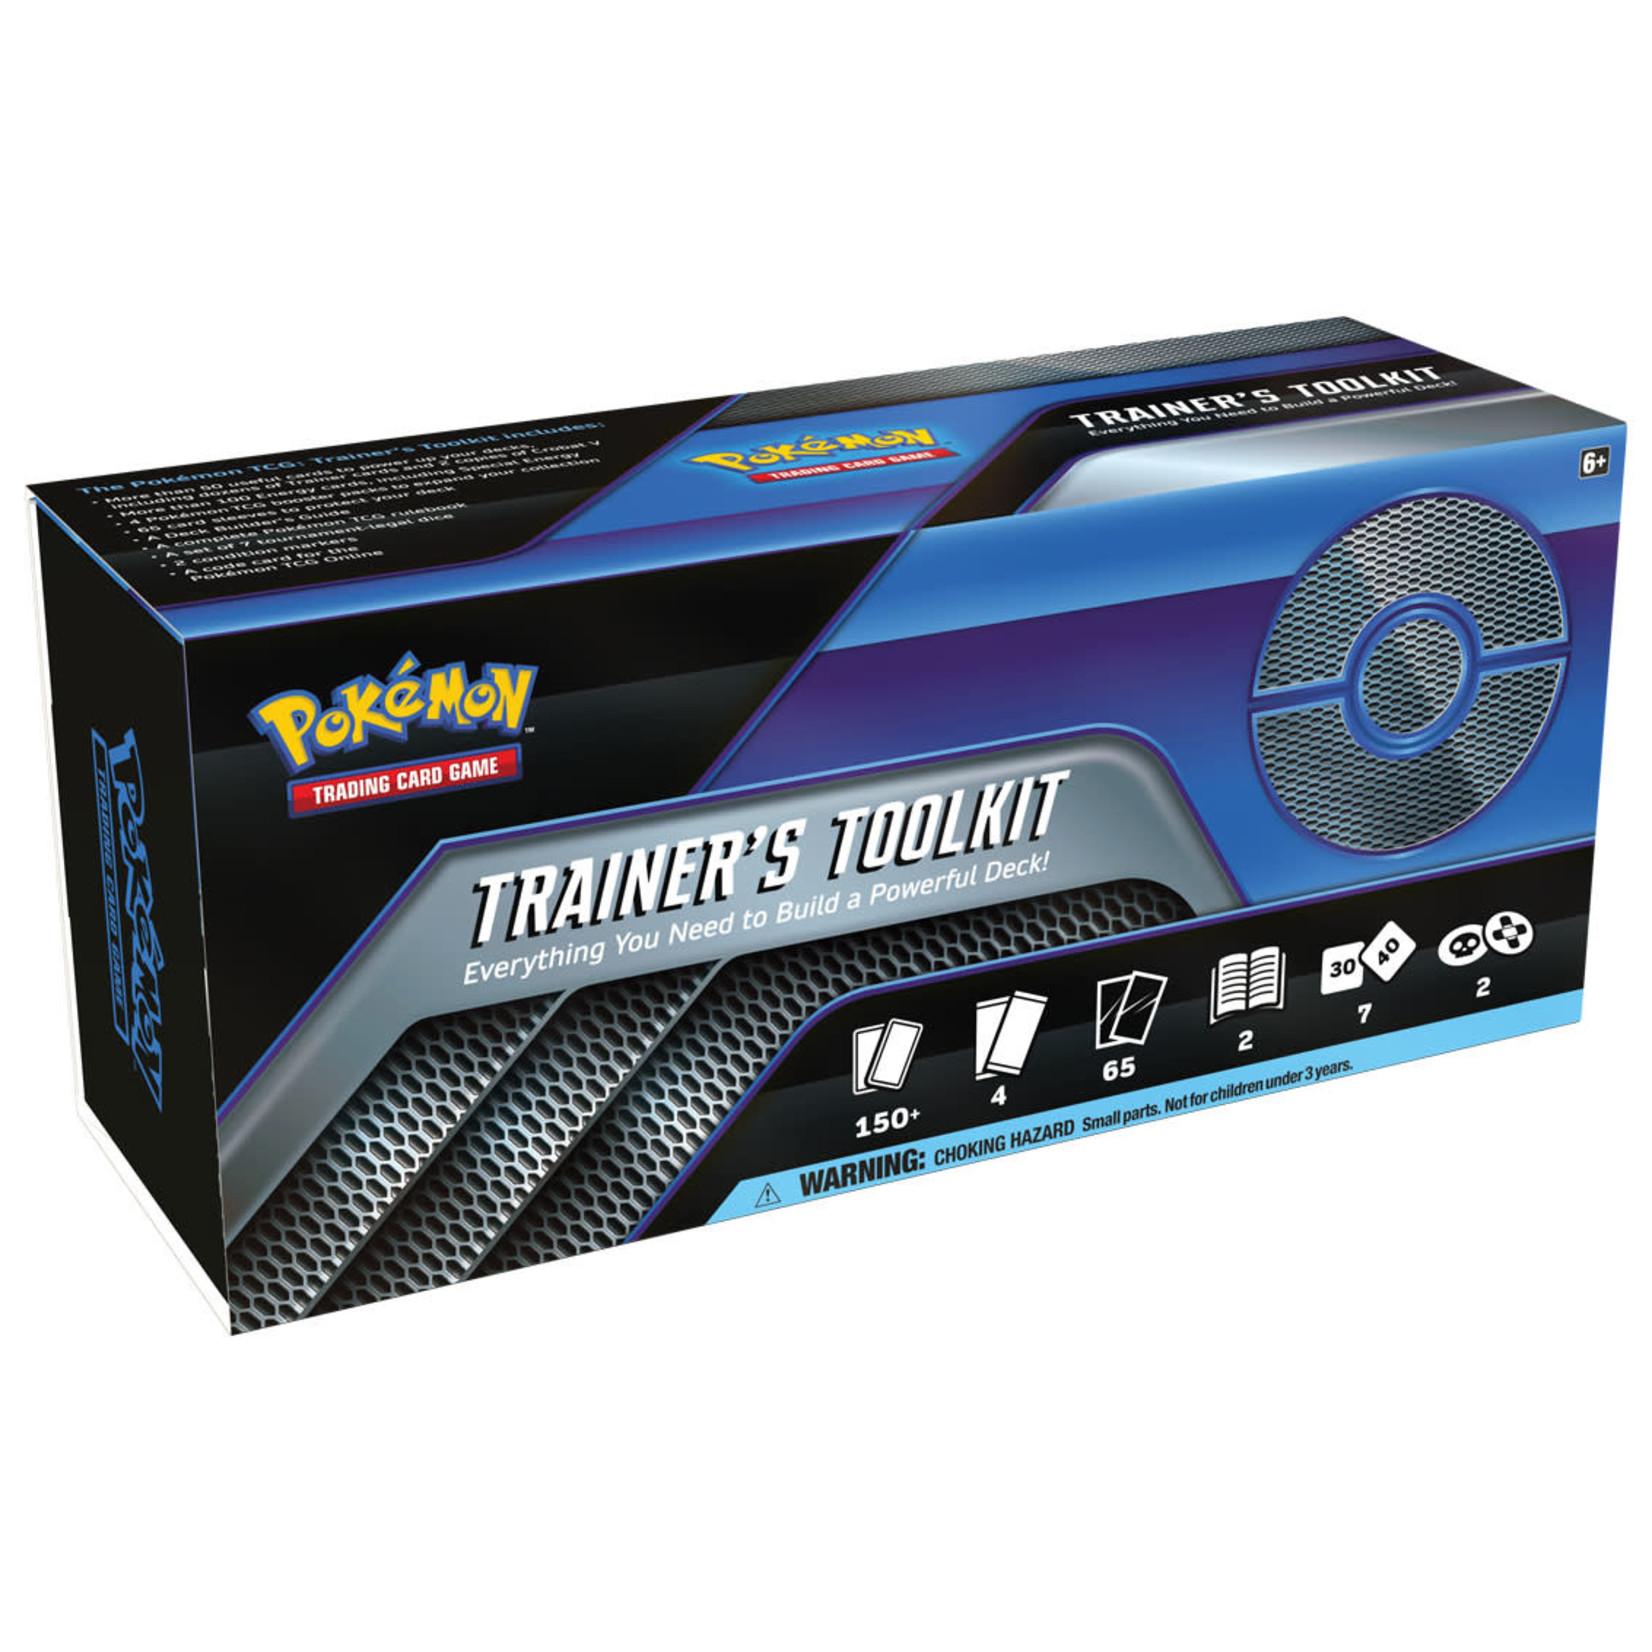 Pokémon Pokémon TCG: Trainer's Toolkit 2021